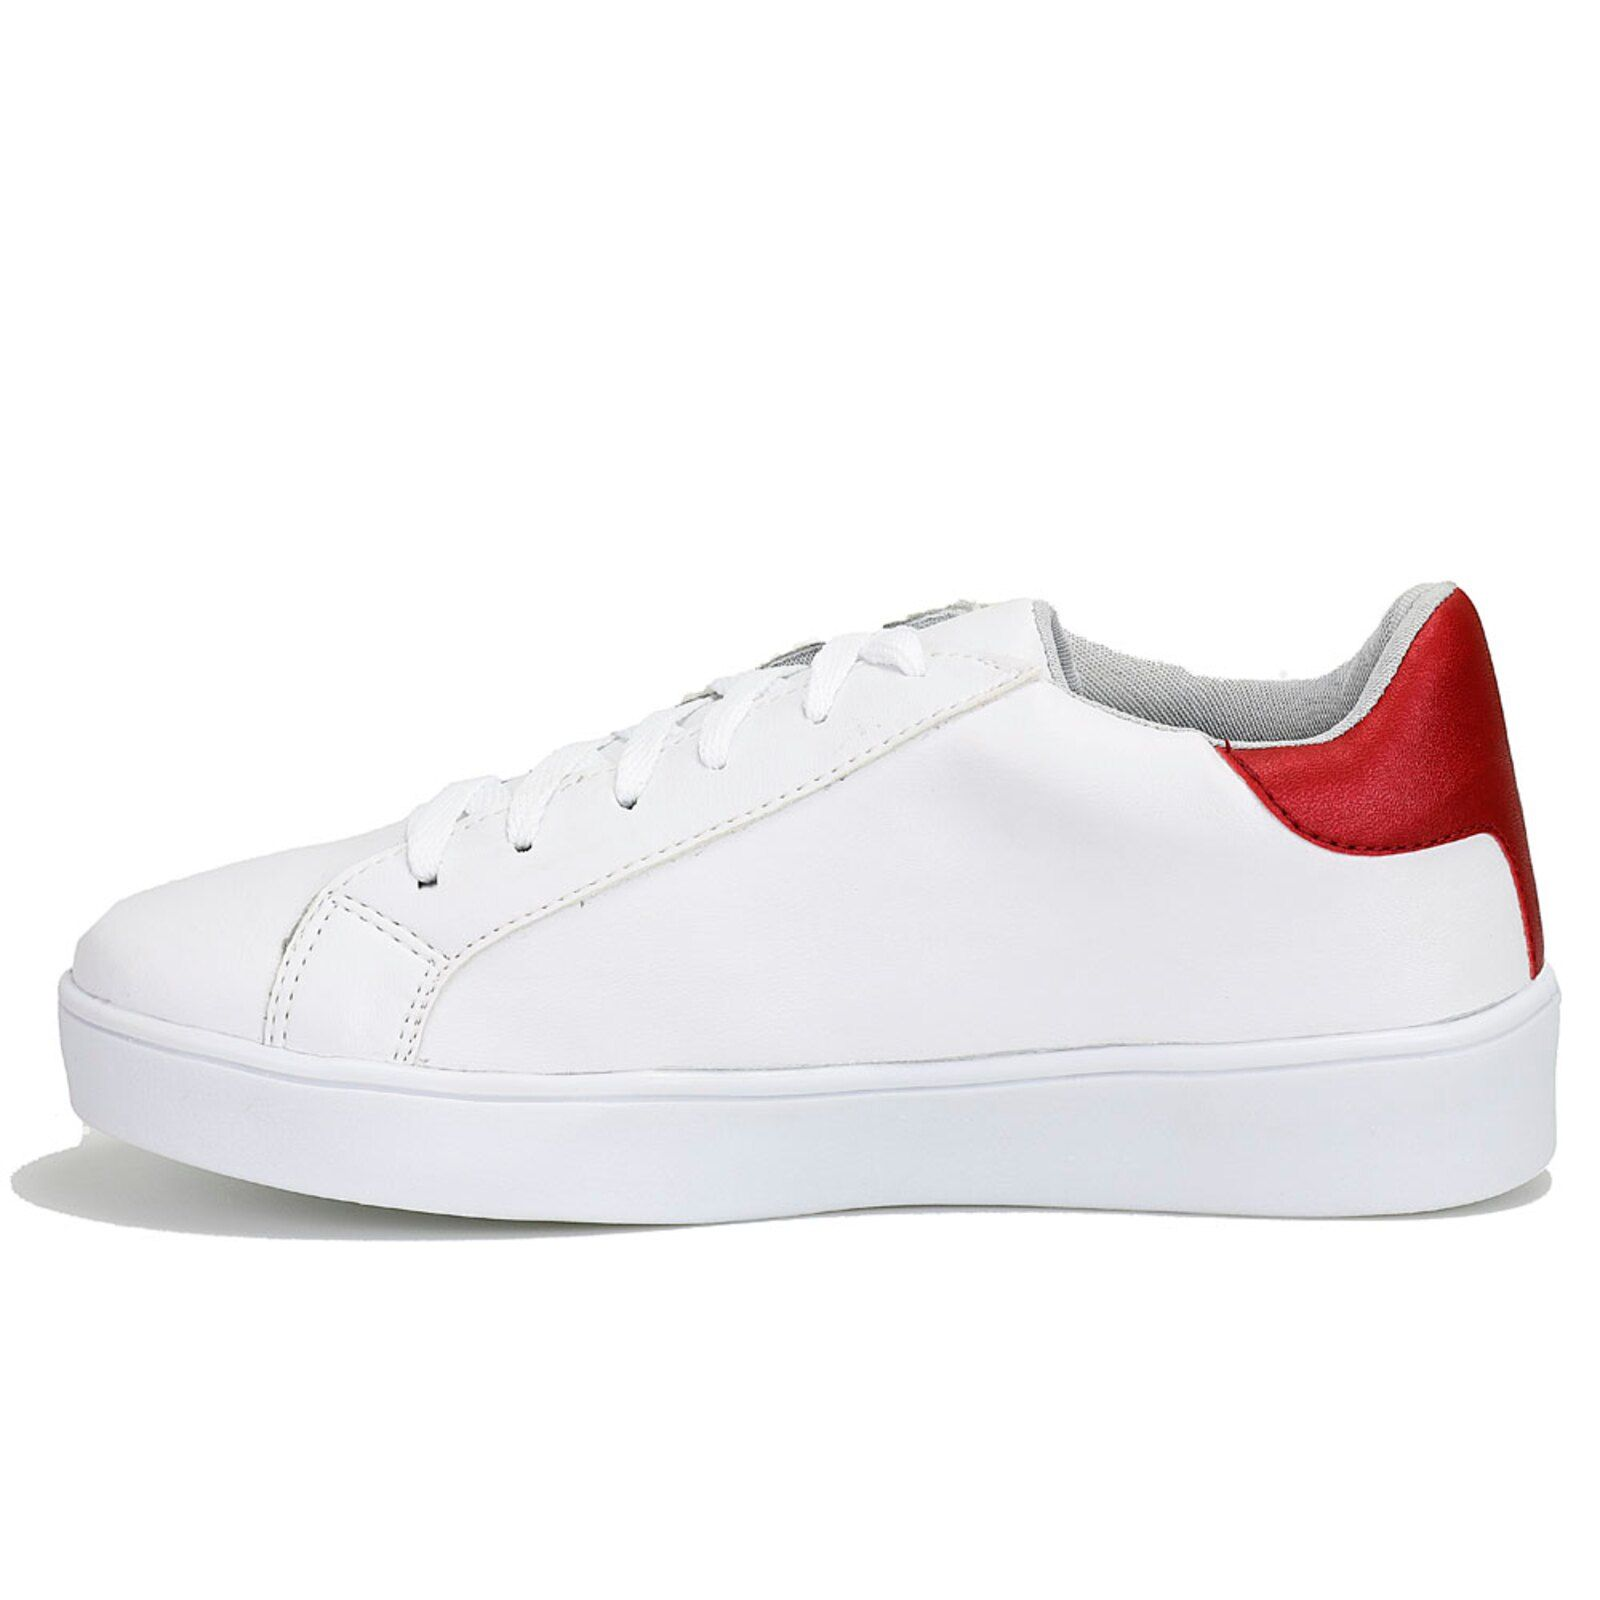 Photo of DHL Sapatos Brancos Casuais – 600Bee White